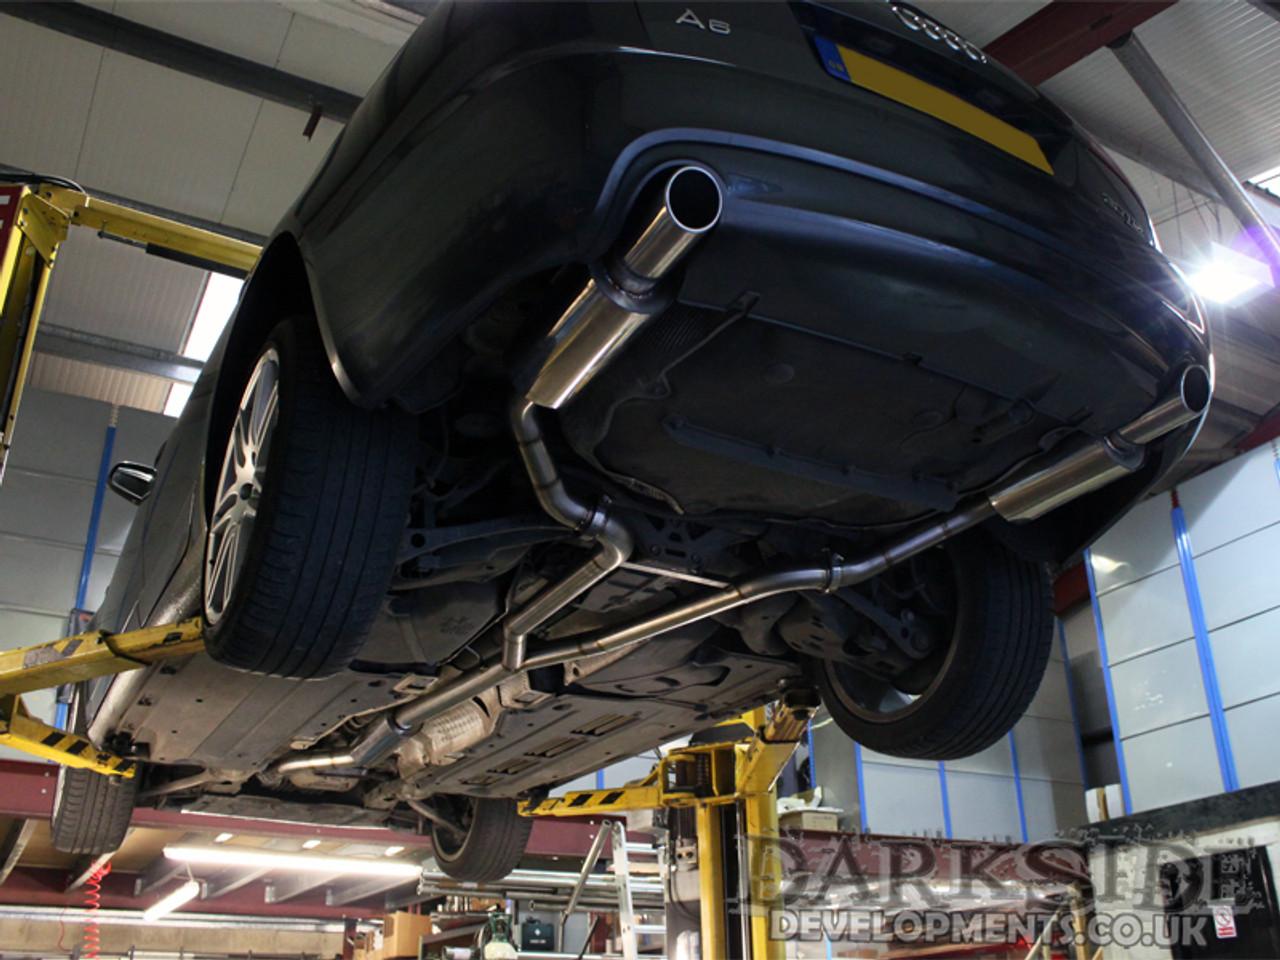 darkside developments custom exhaust systems